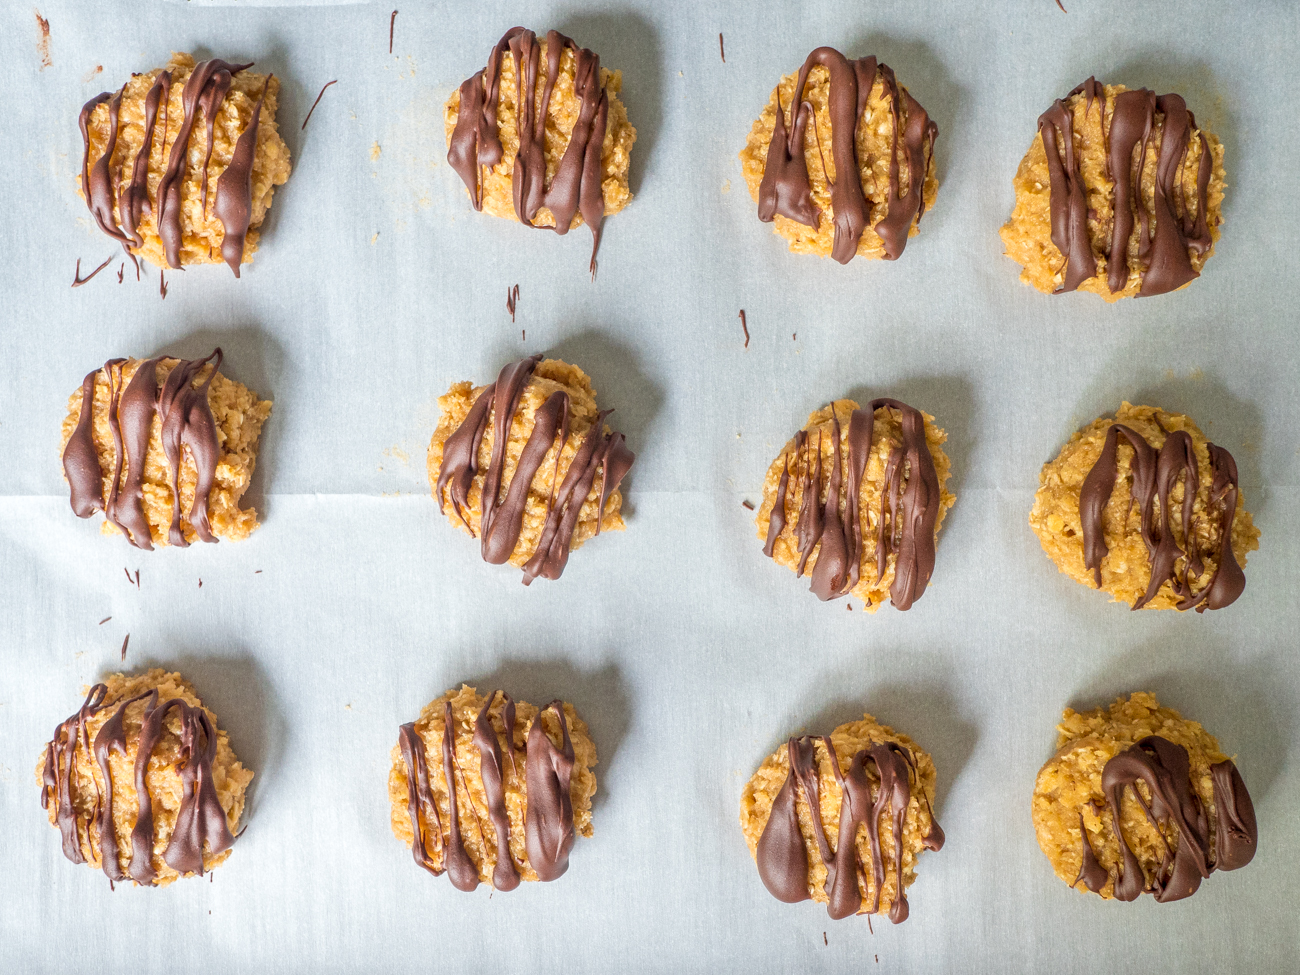 Preacher Cookies Horizontal 1